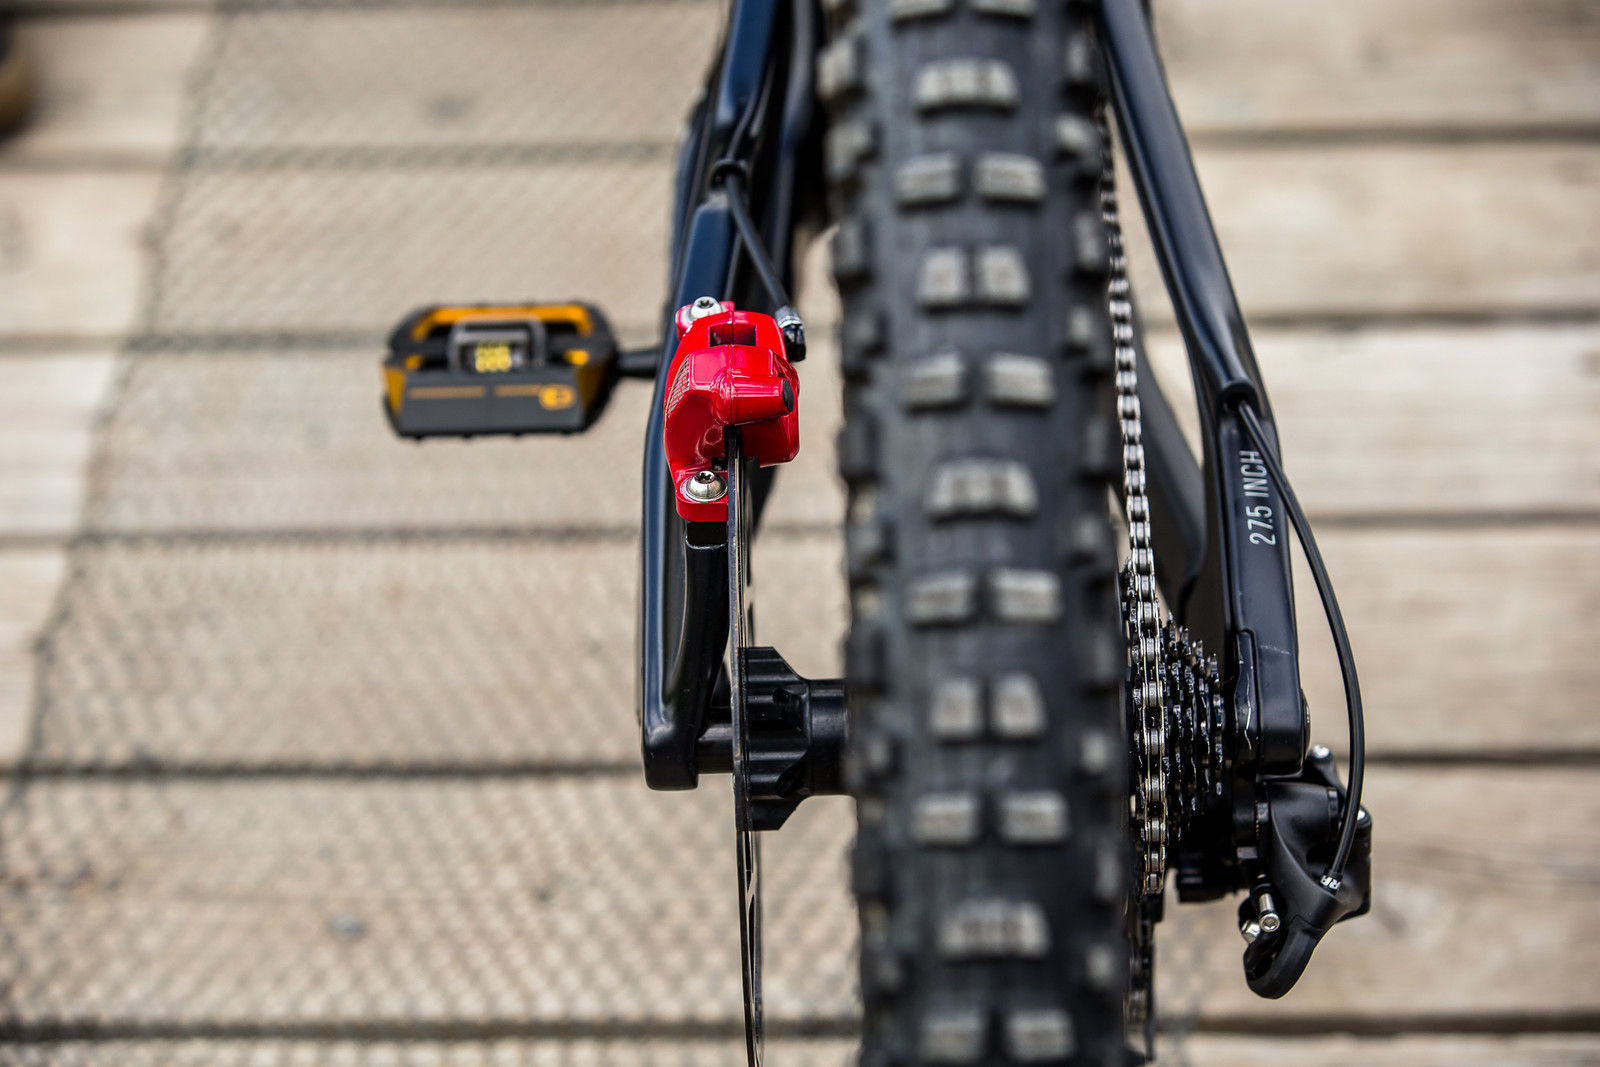 SRAM CODE Brakes - WINNING BIKE - Vali Höll's YT TUES - Mountain Biking Pictures - Vital MTB